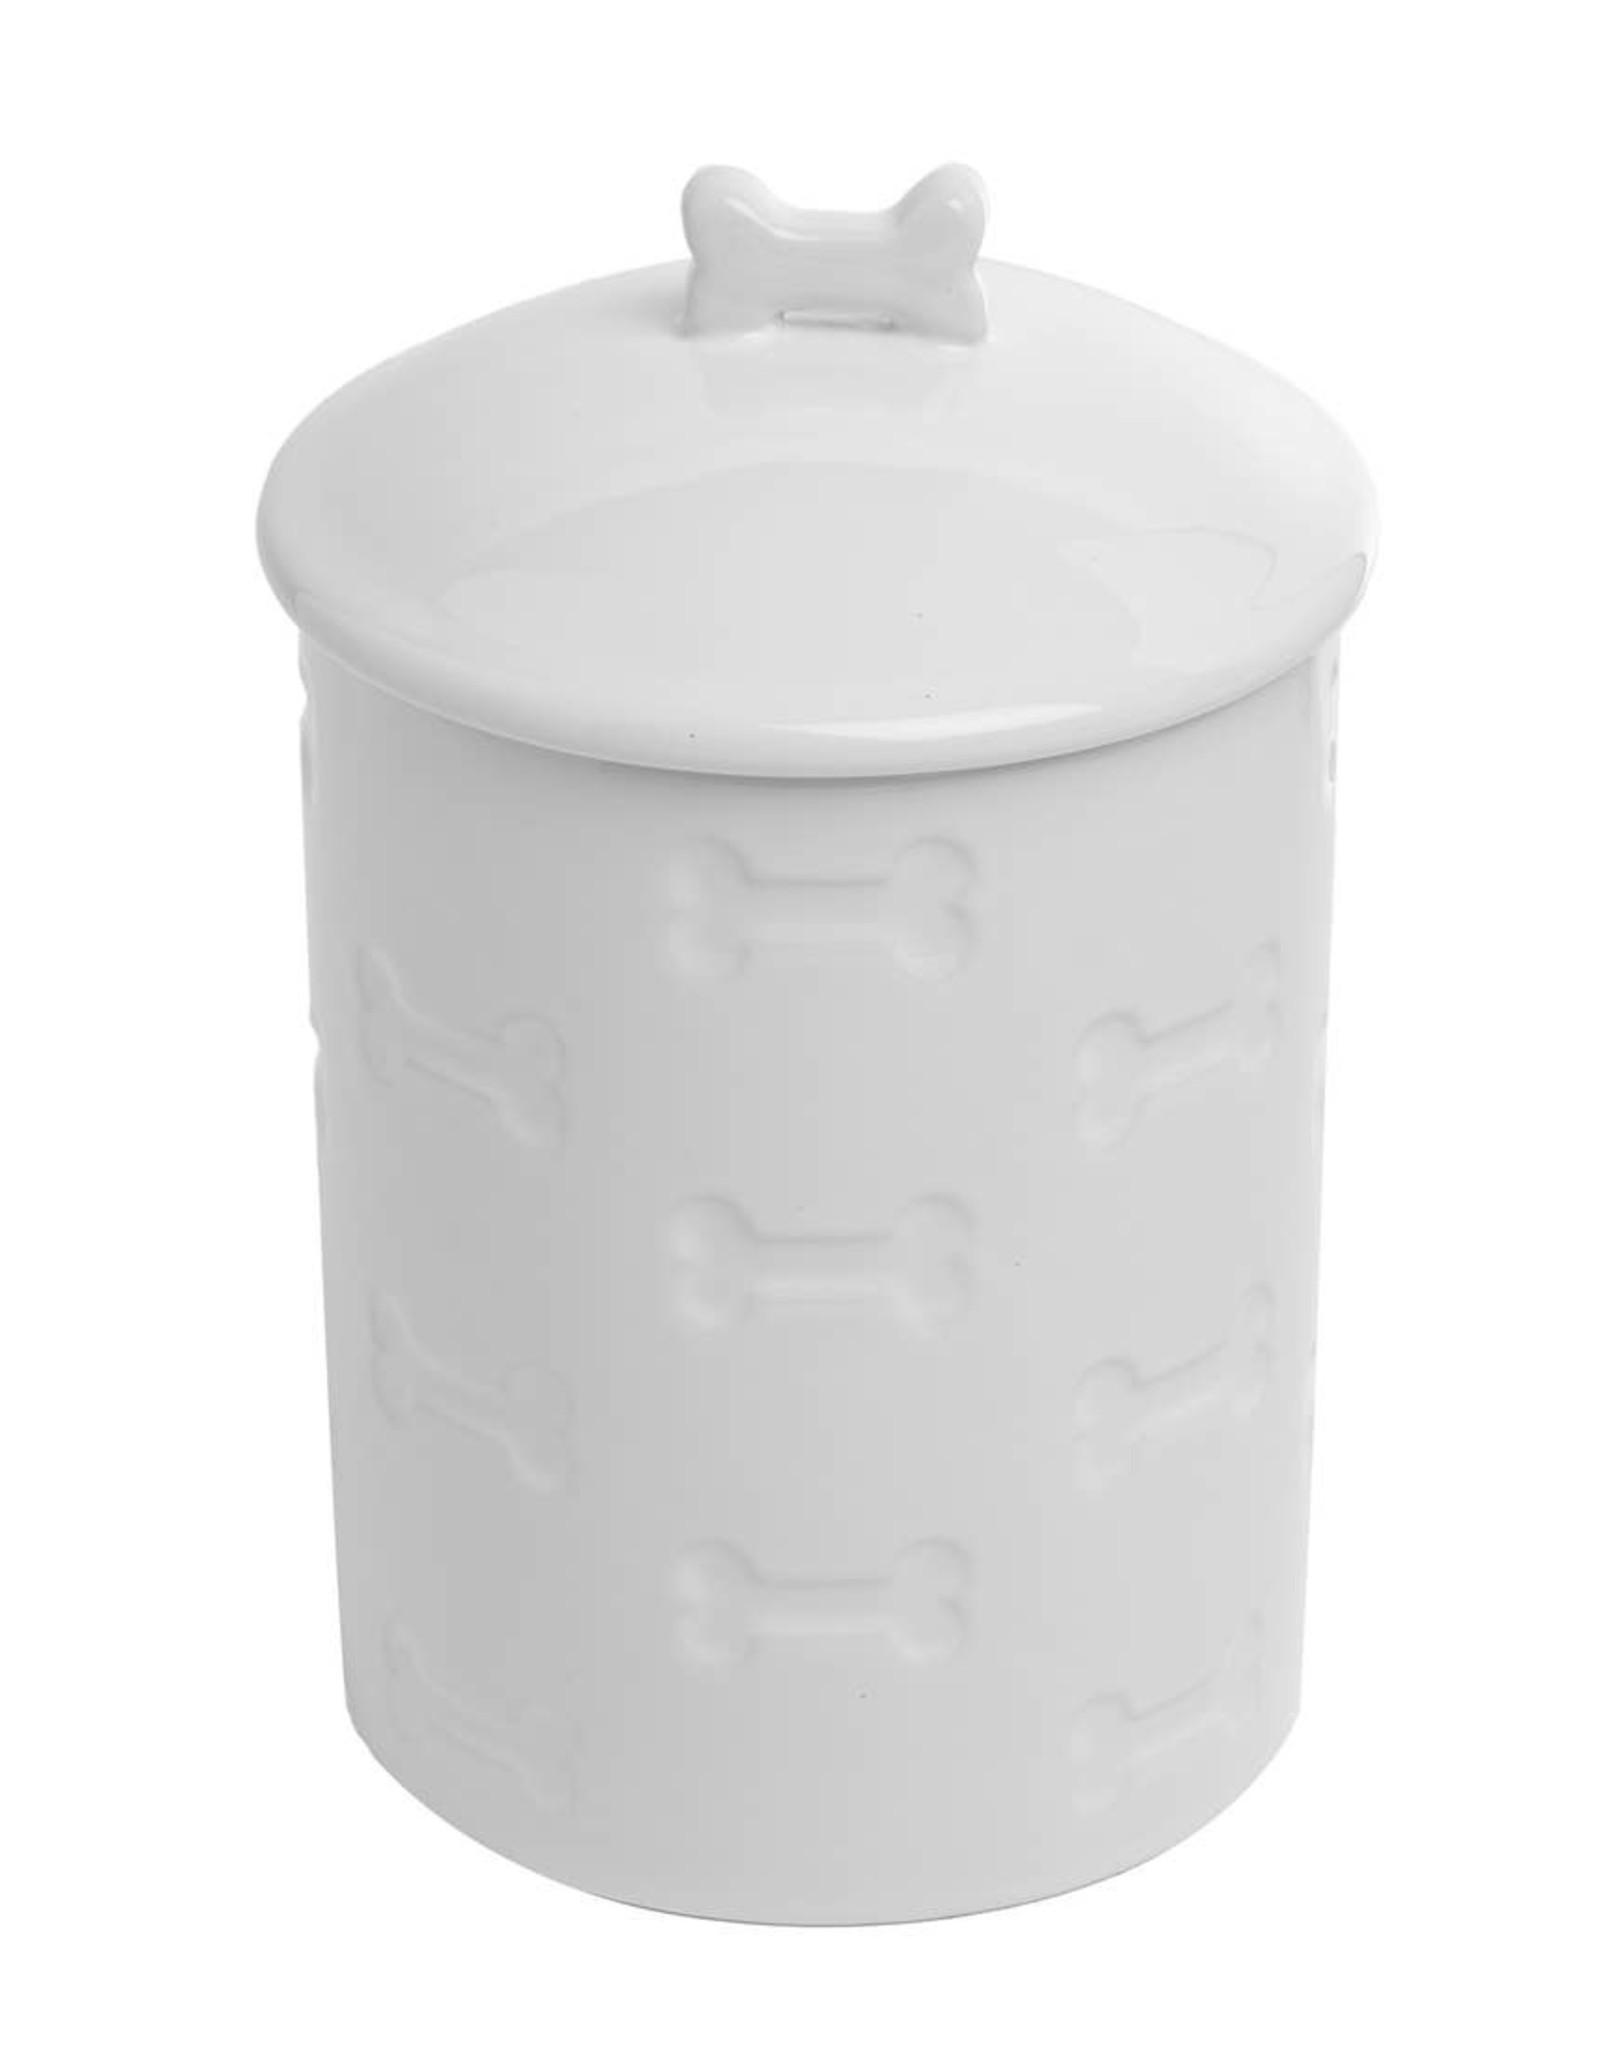 Park Life Designs Manor White Treat Jar